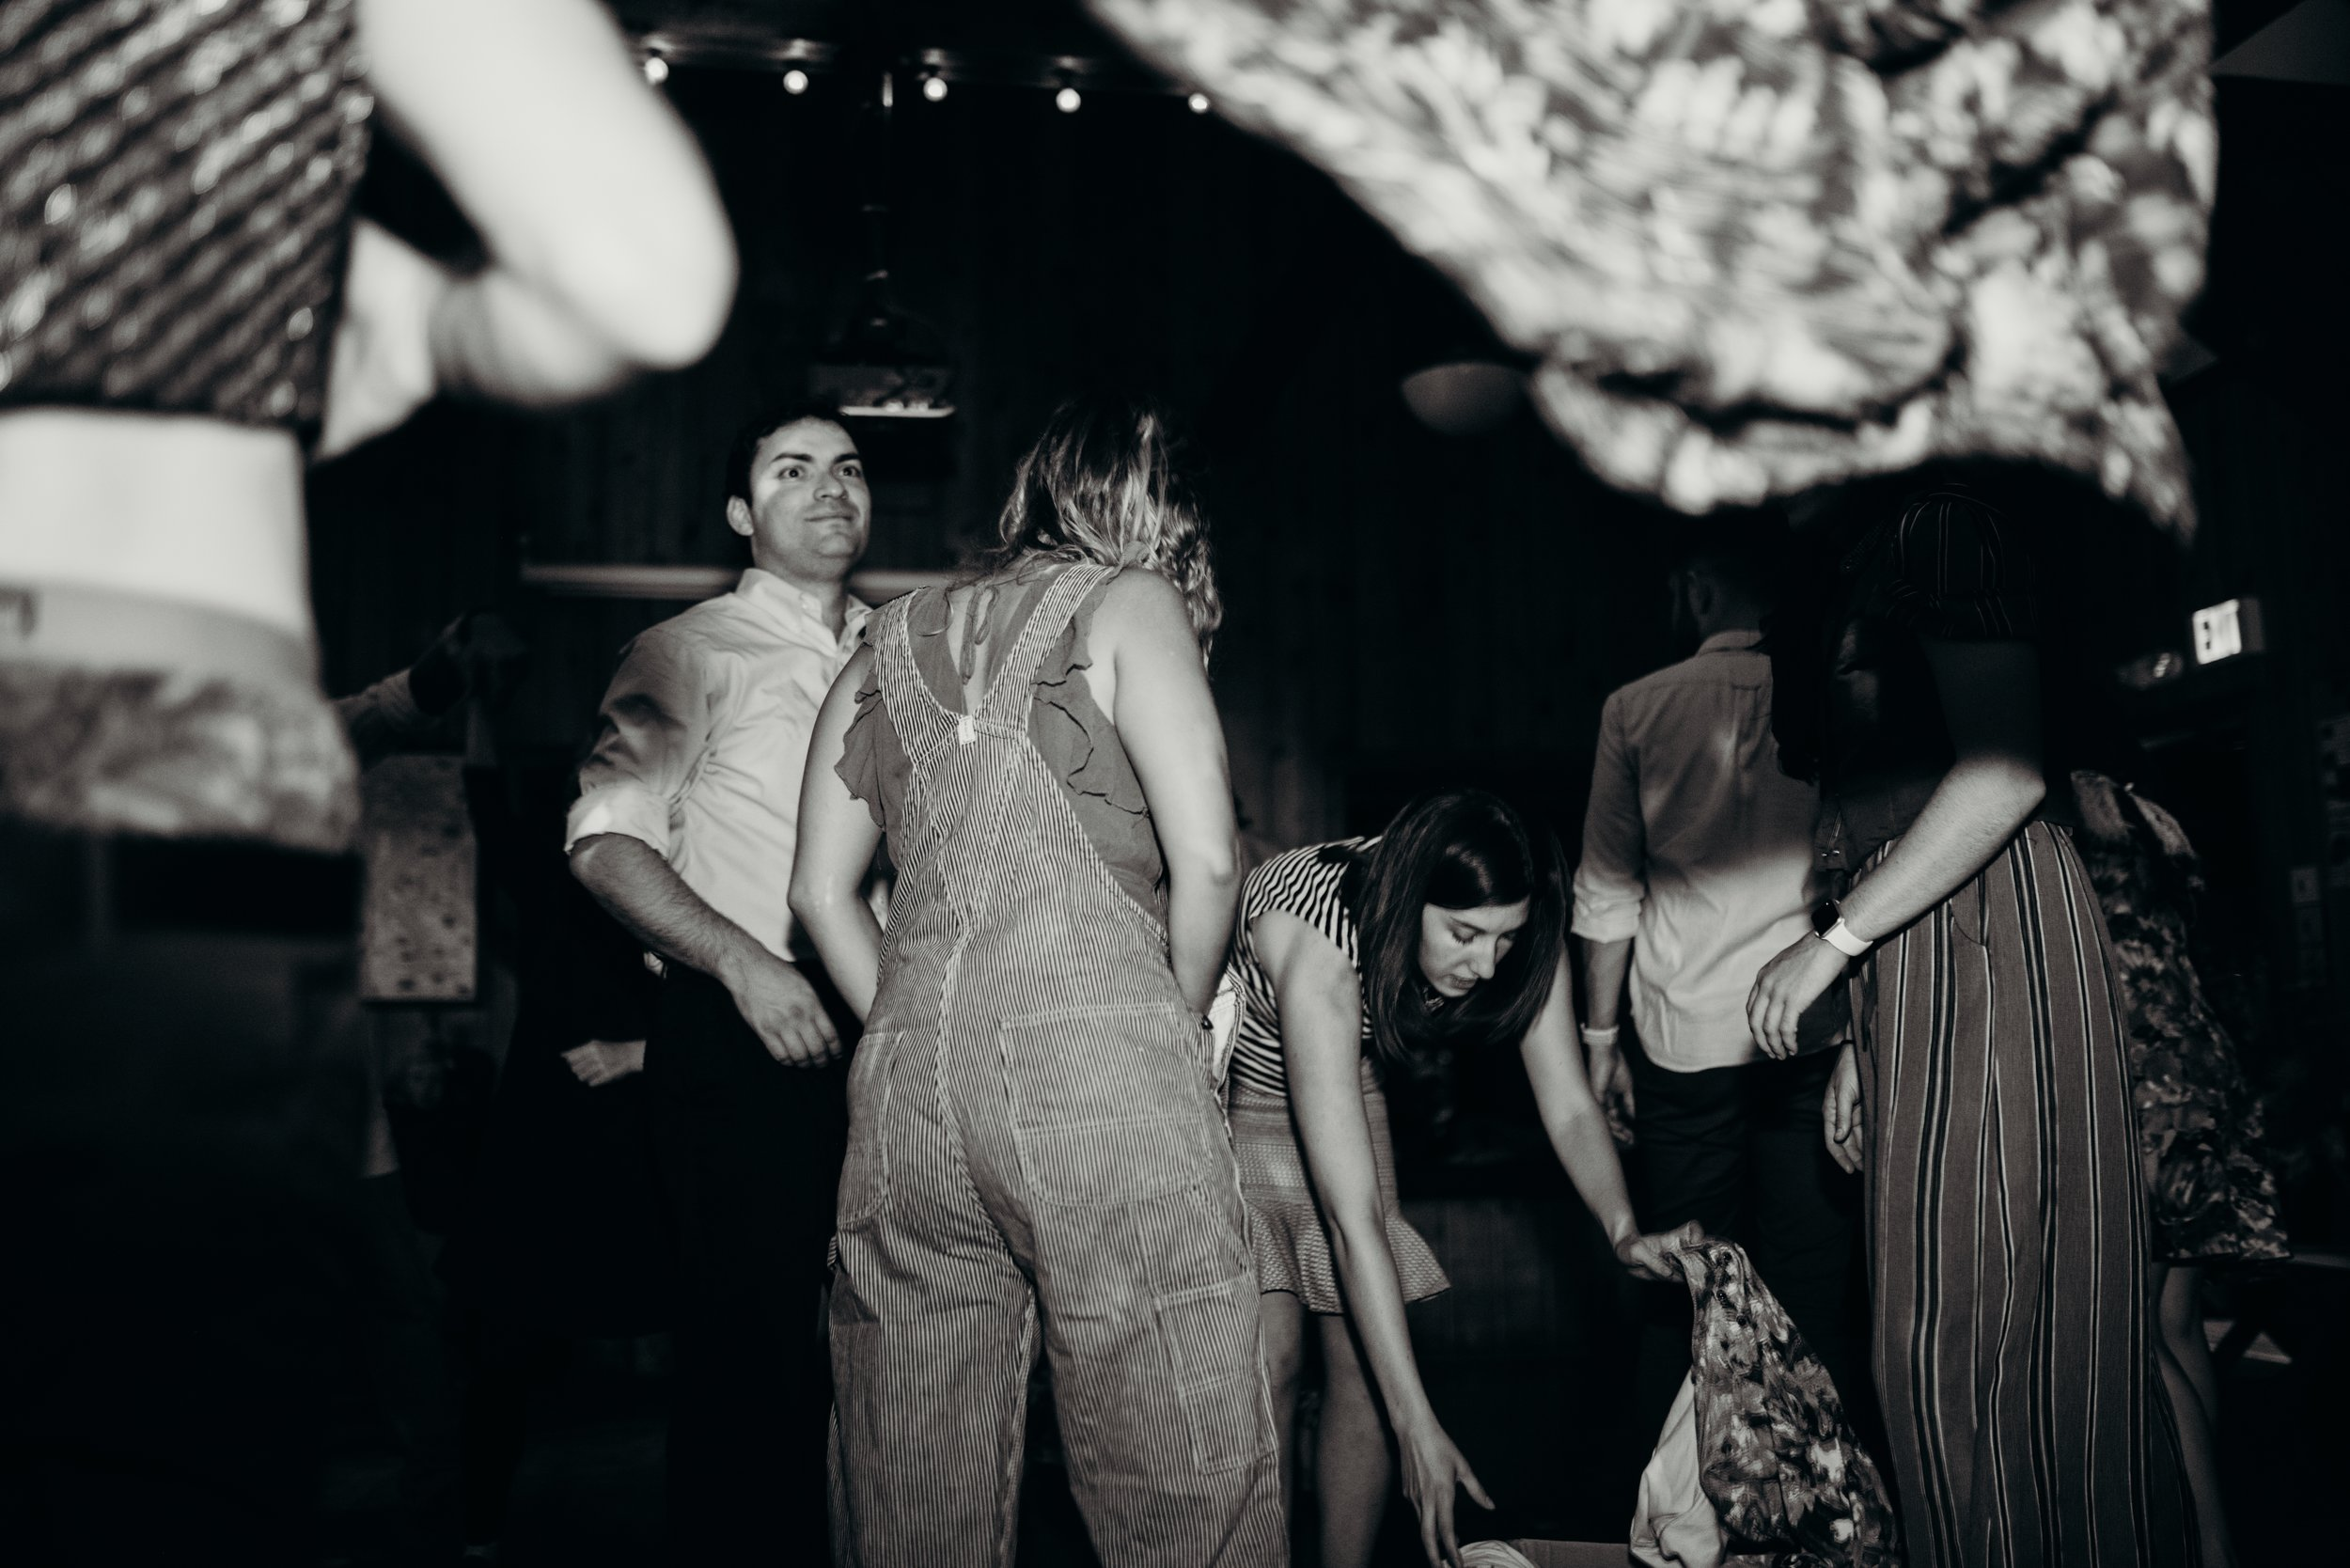 10 Dancing-37.jpeg